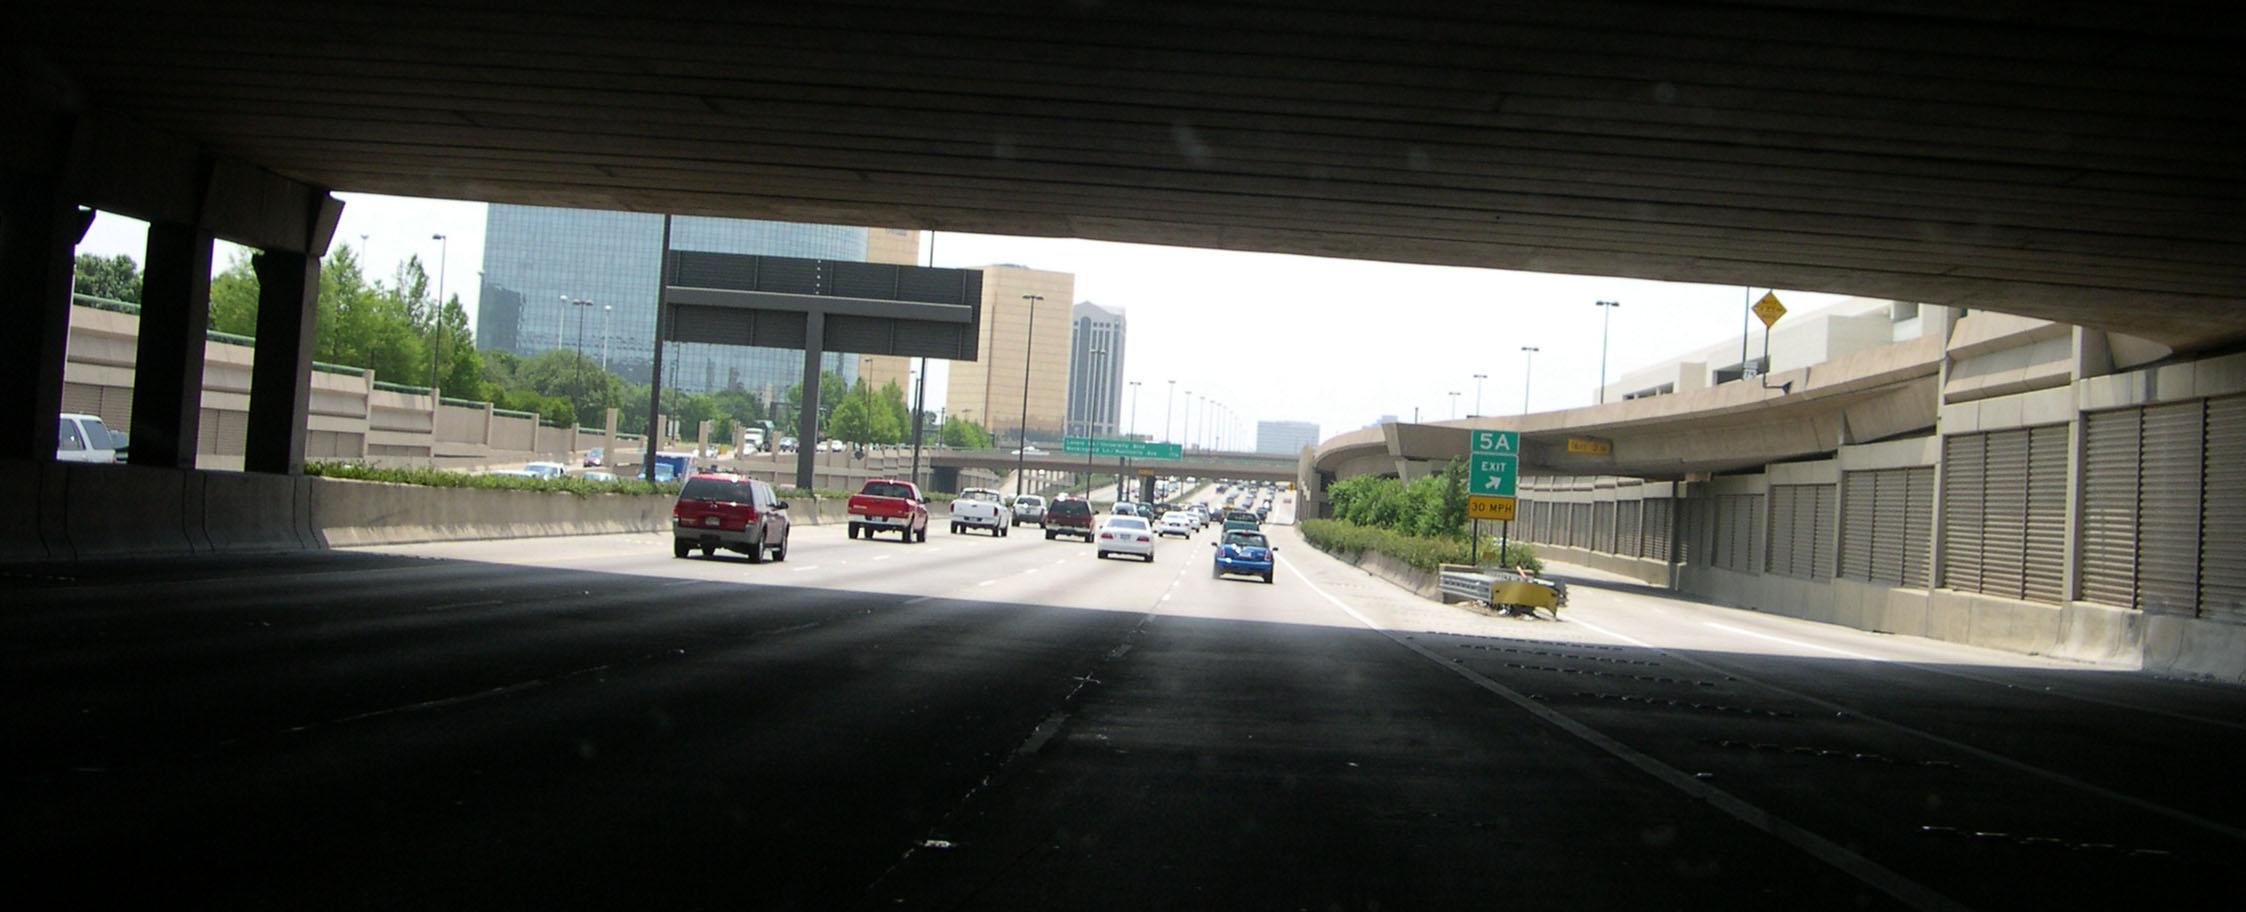 File:Central Expressway near NorthPark Center, Dallas, TX